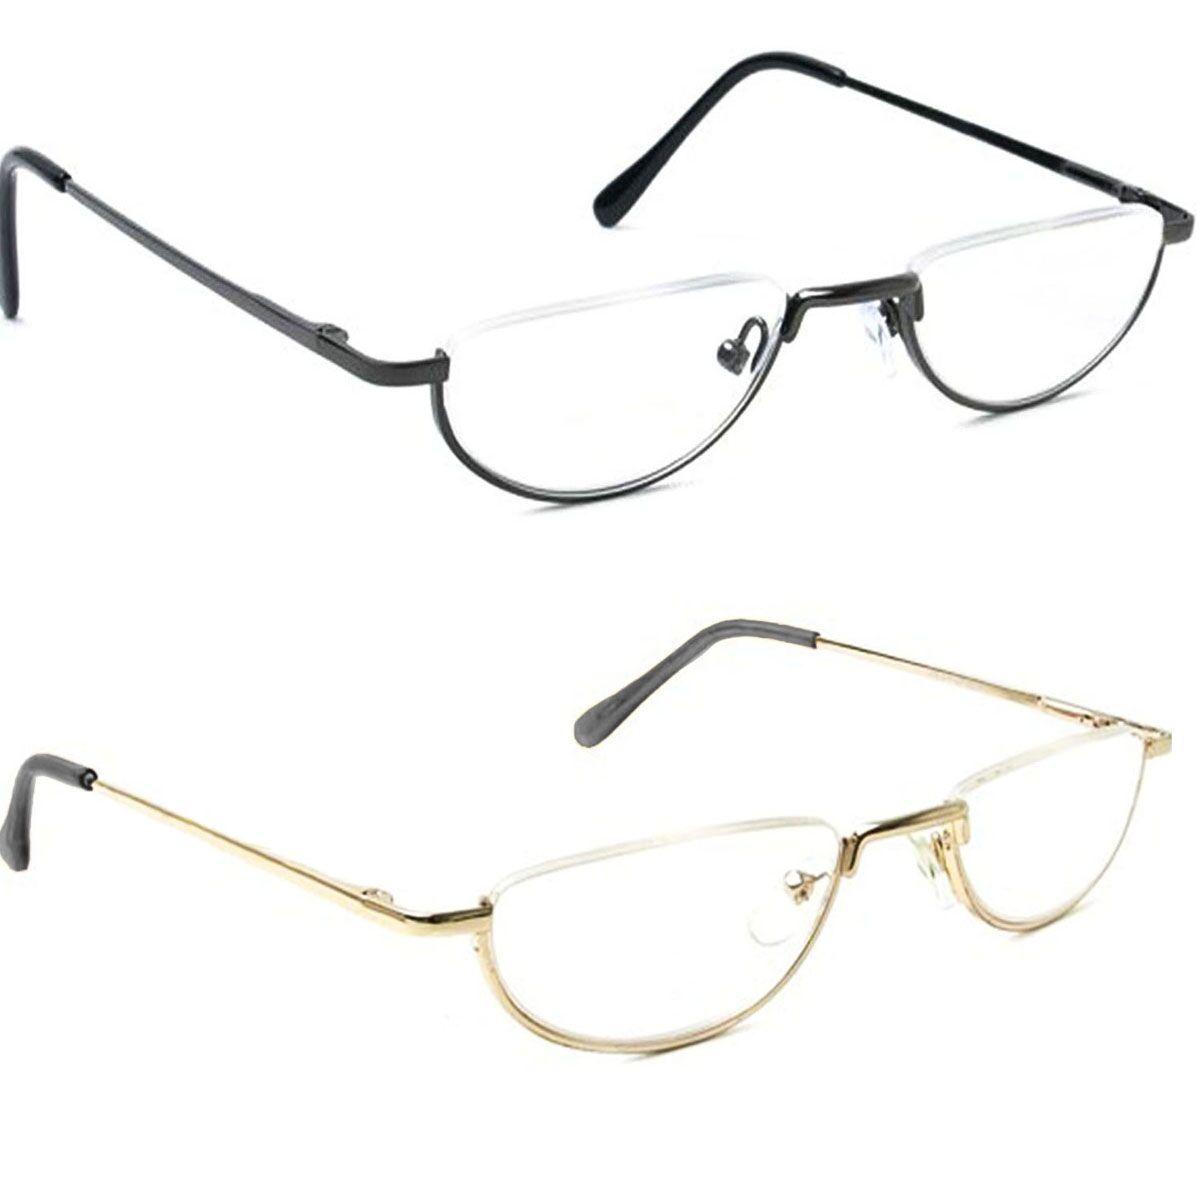 a30020ea26  12.99 AUD - Best Sell Half Moon Rim Vintage Spring Hinge Eyeglass Frames  Reading Glasses  ebay  Fashion